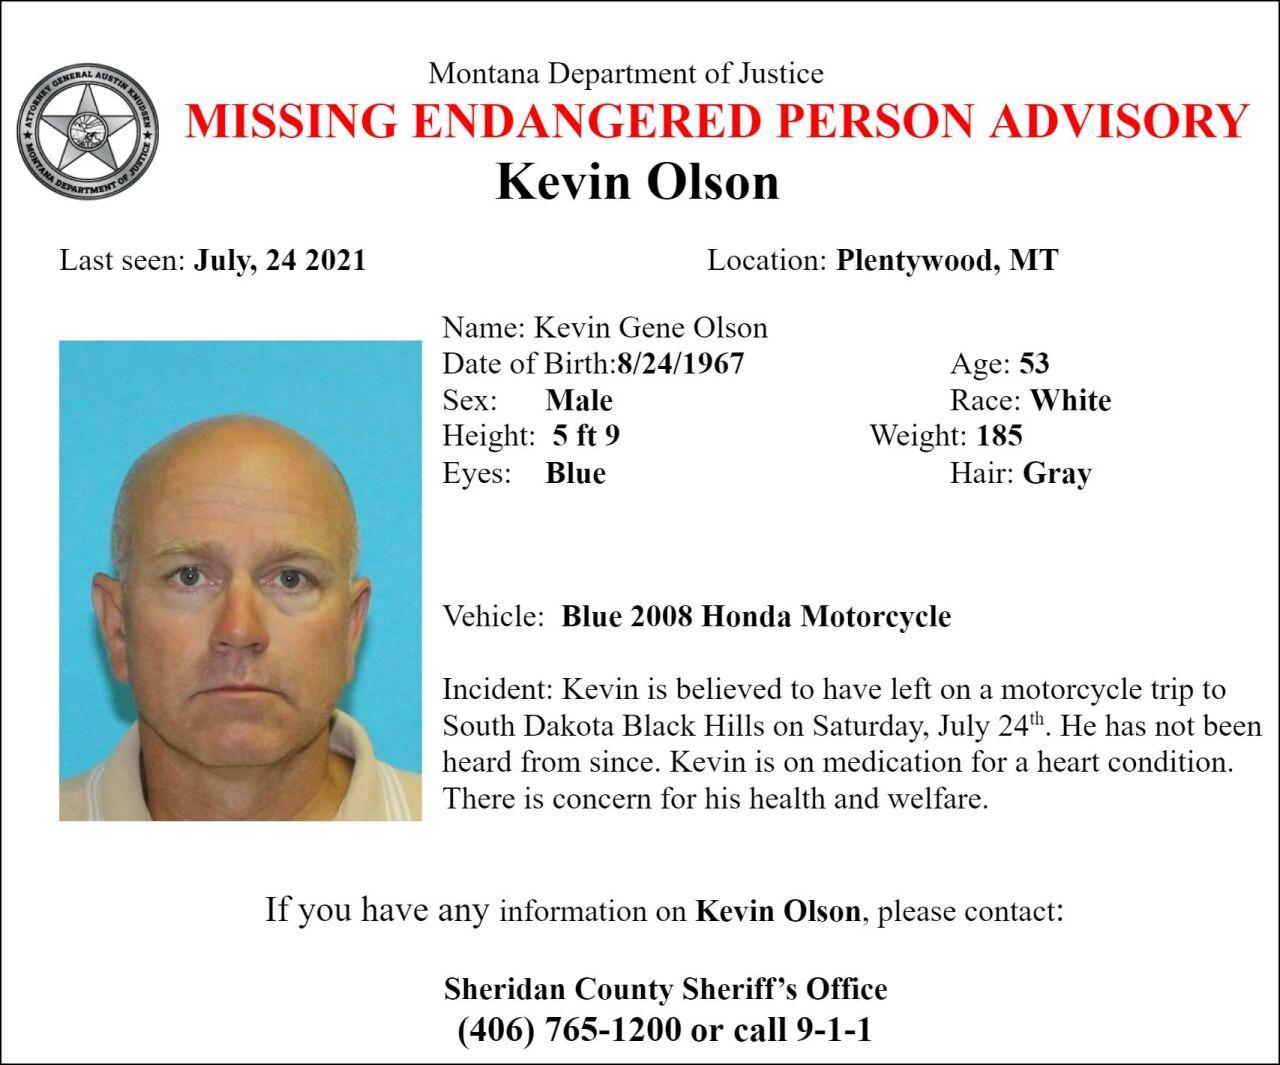 Missing/Endangered Person Advisory for Kevin Olson